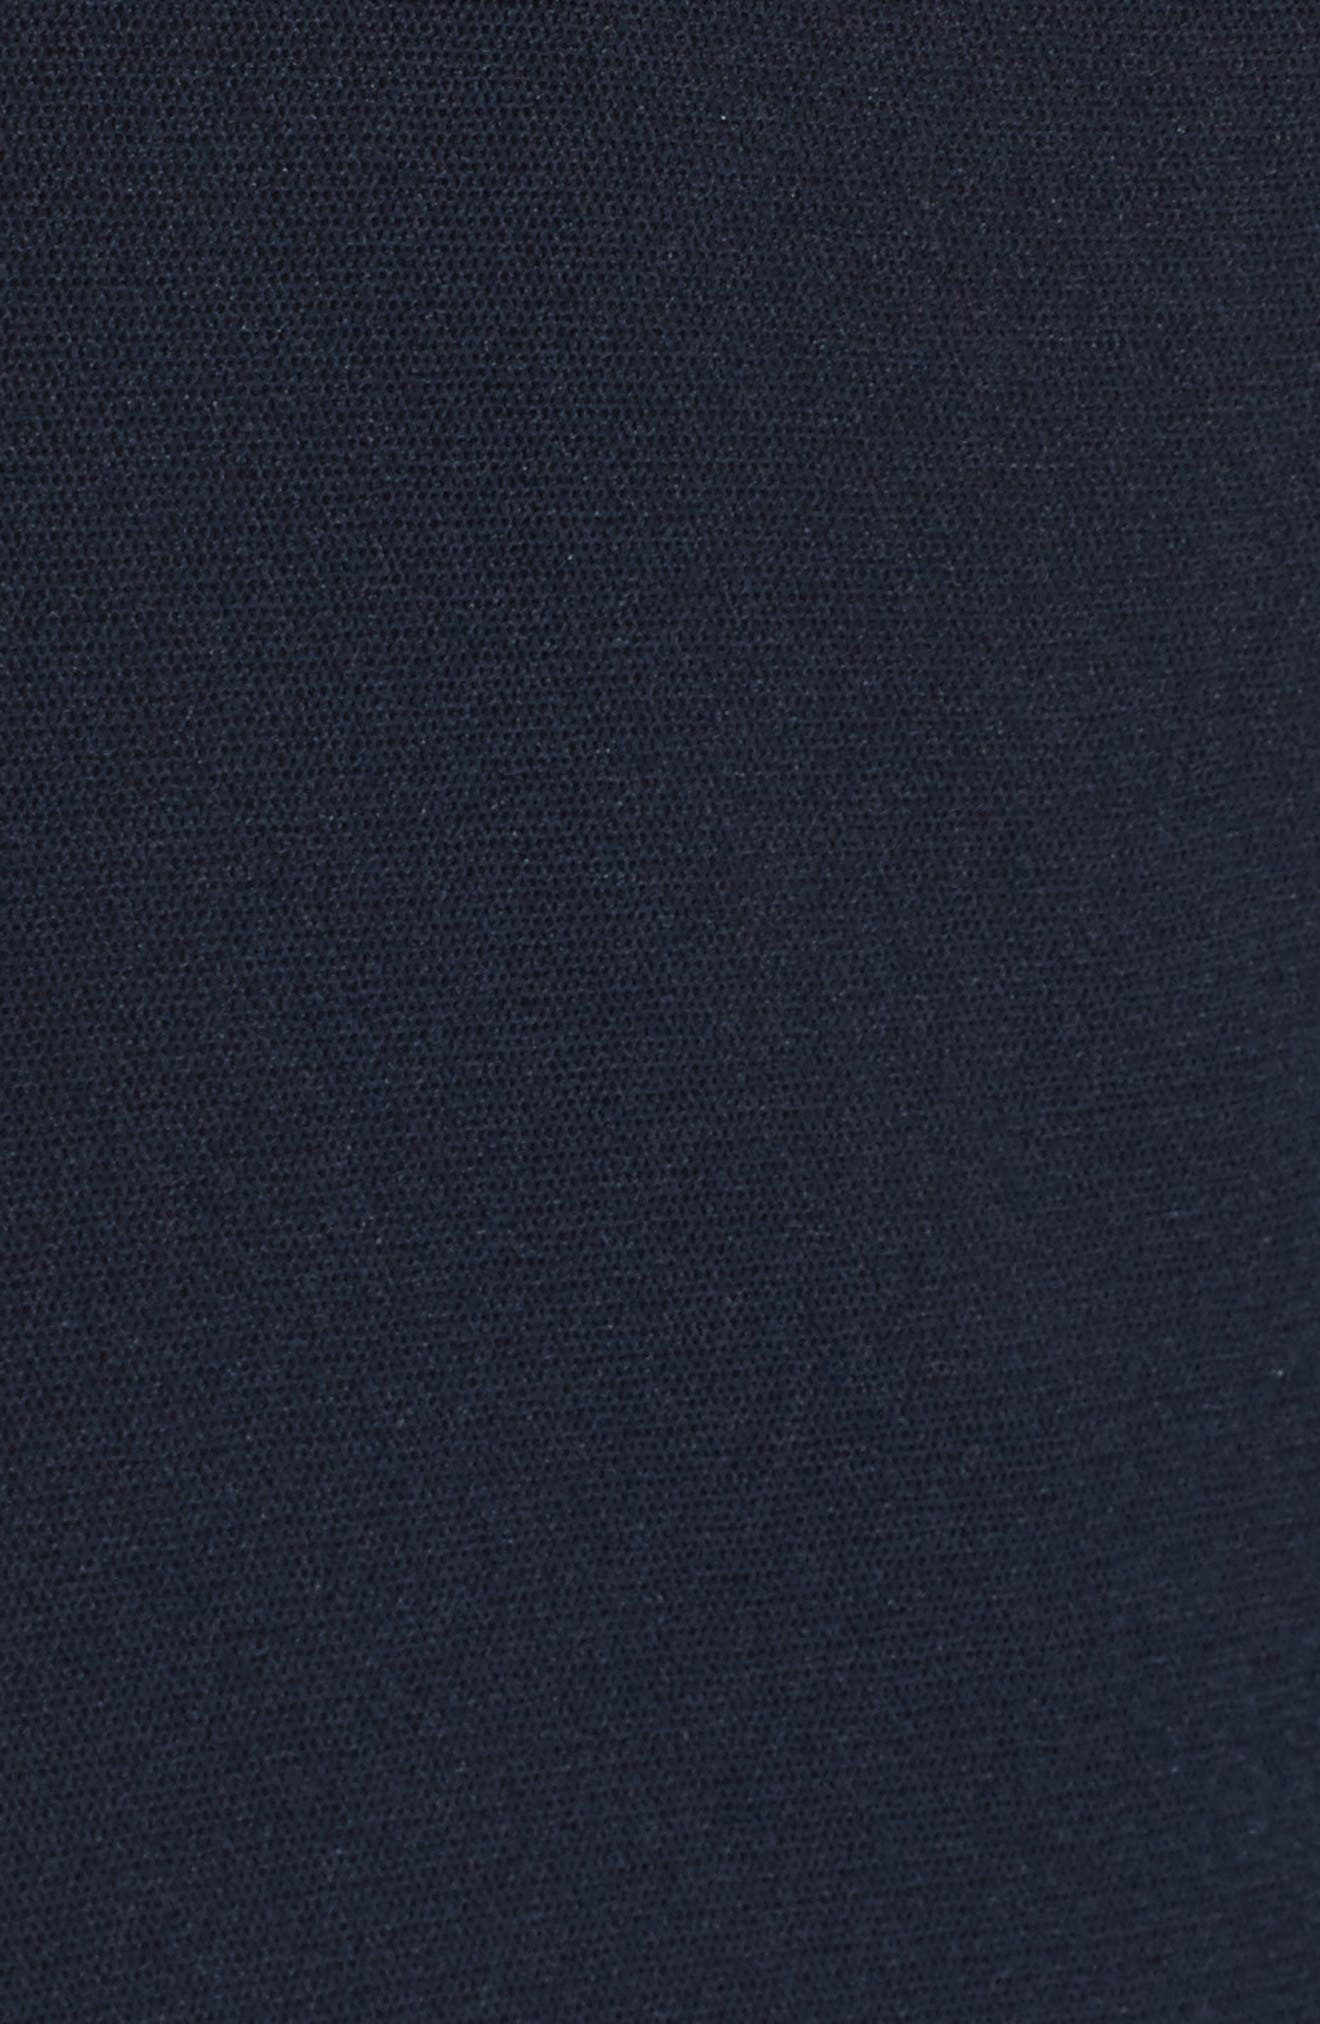 Reversible Tulle Dress,                             Alternate thumbnail 5, color,                             001